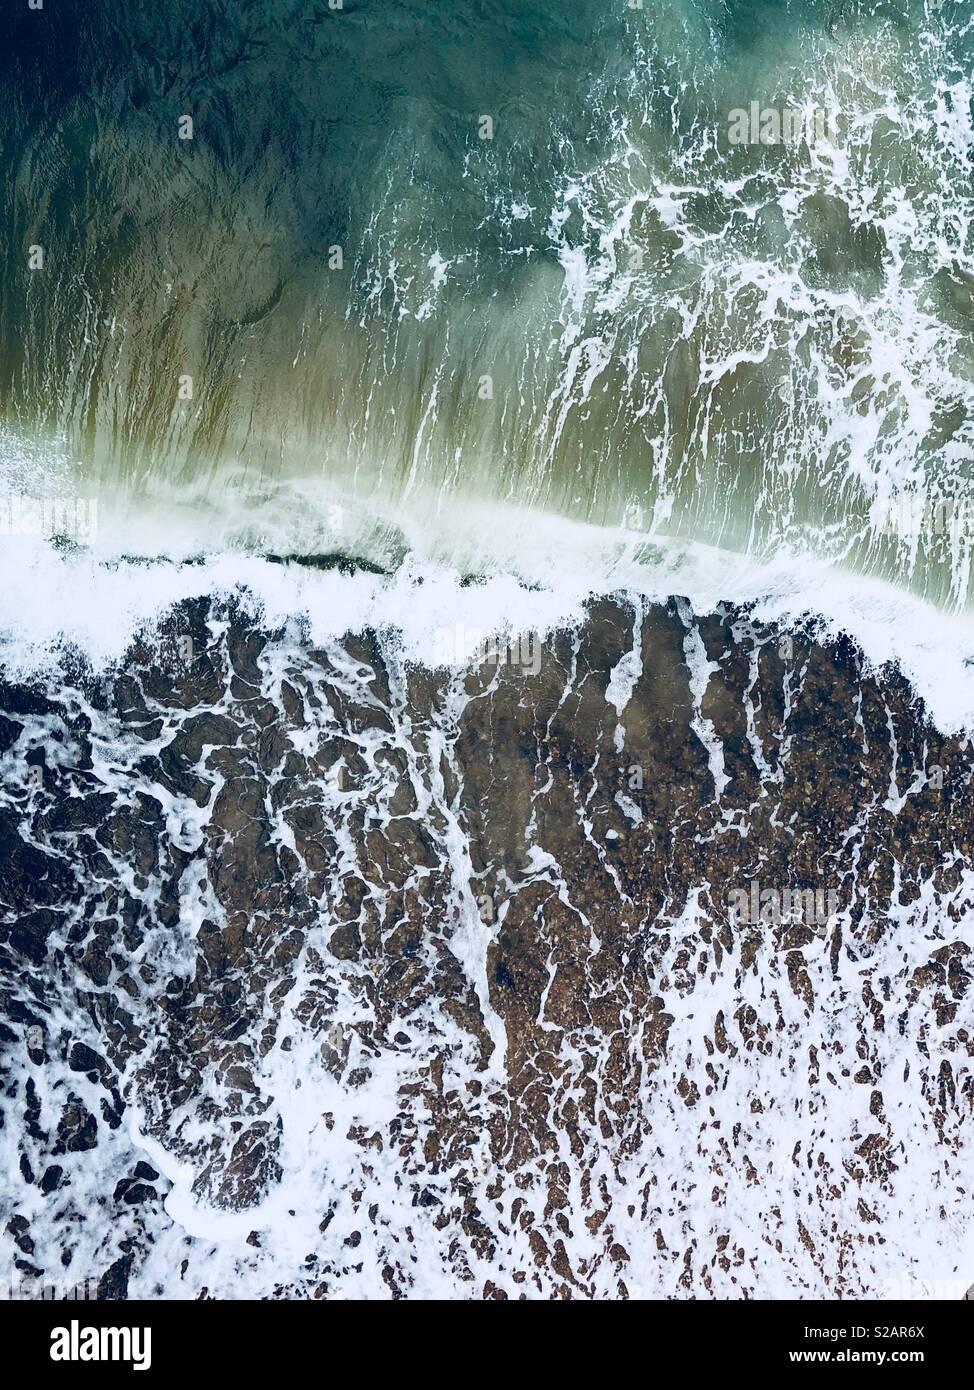 Waves - Stock Image